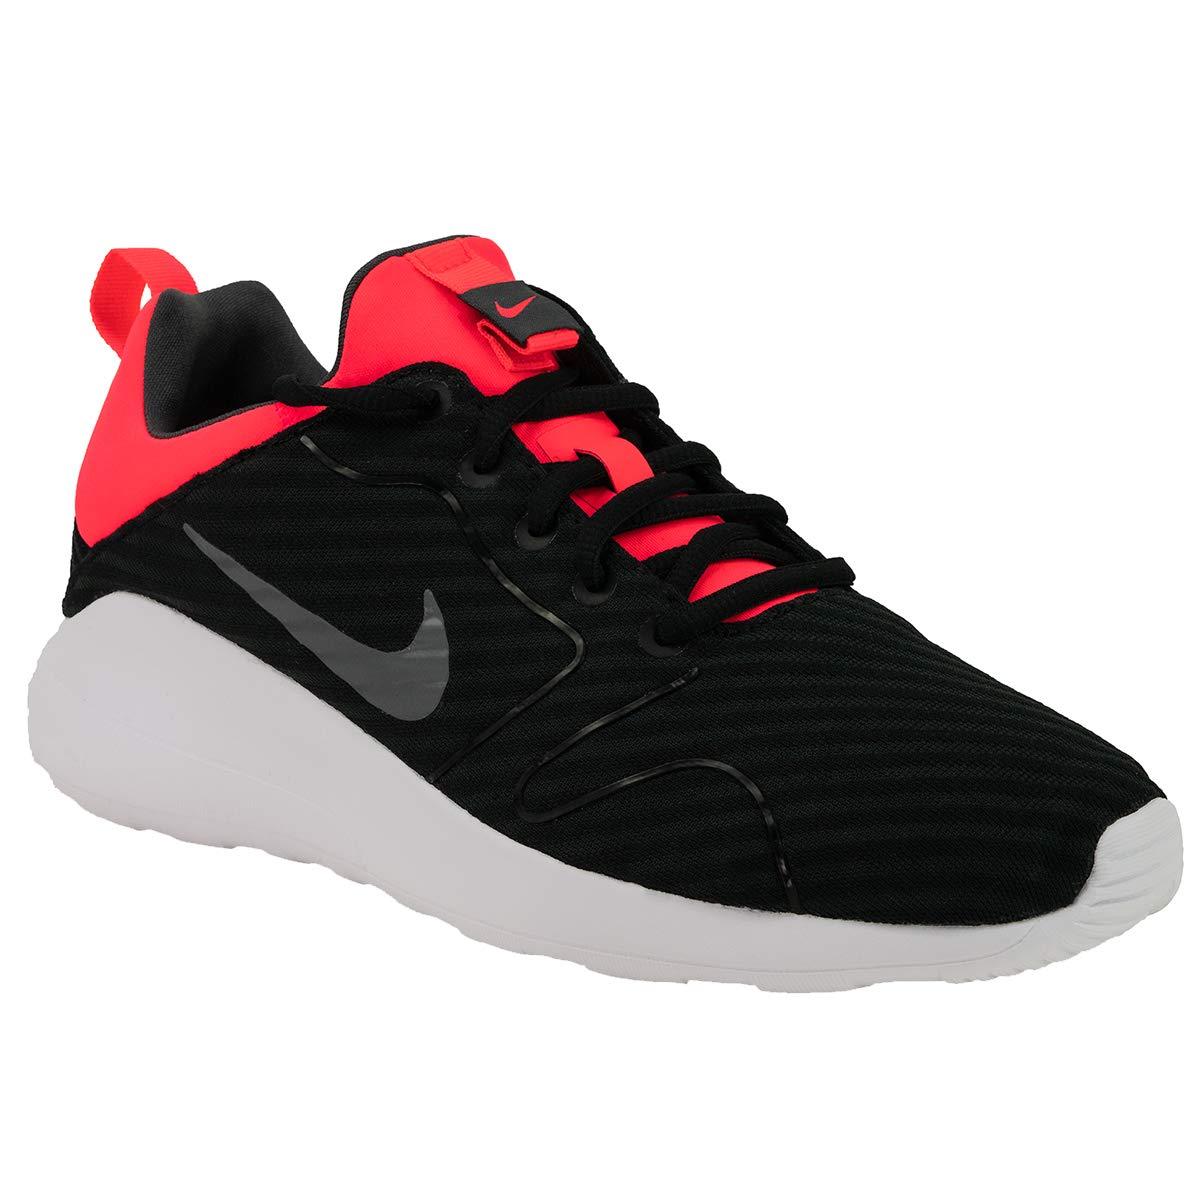 7123127aae3c Galleon - NIKE Men s Kaishi 2.0 SE Running Shoes Black Grey Solar Red 9.5